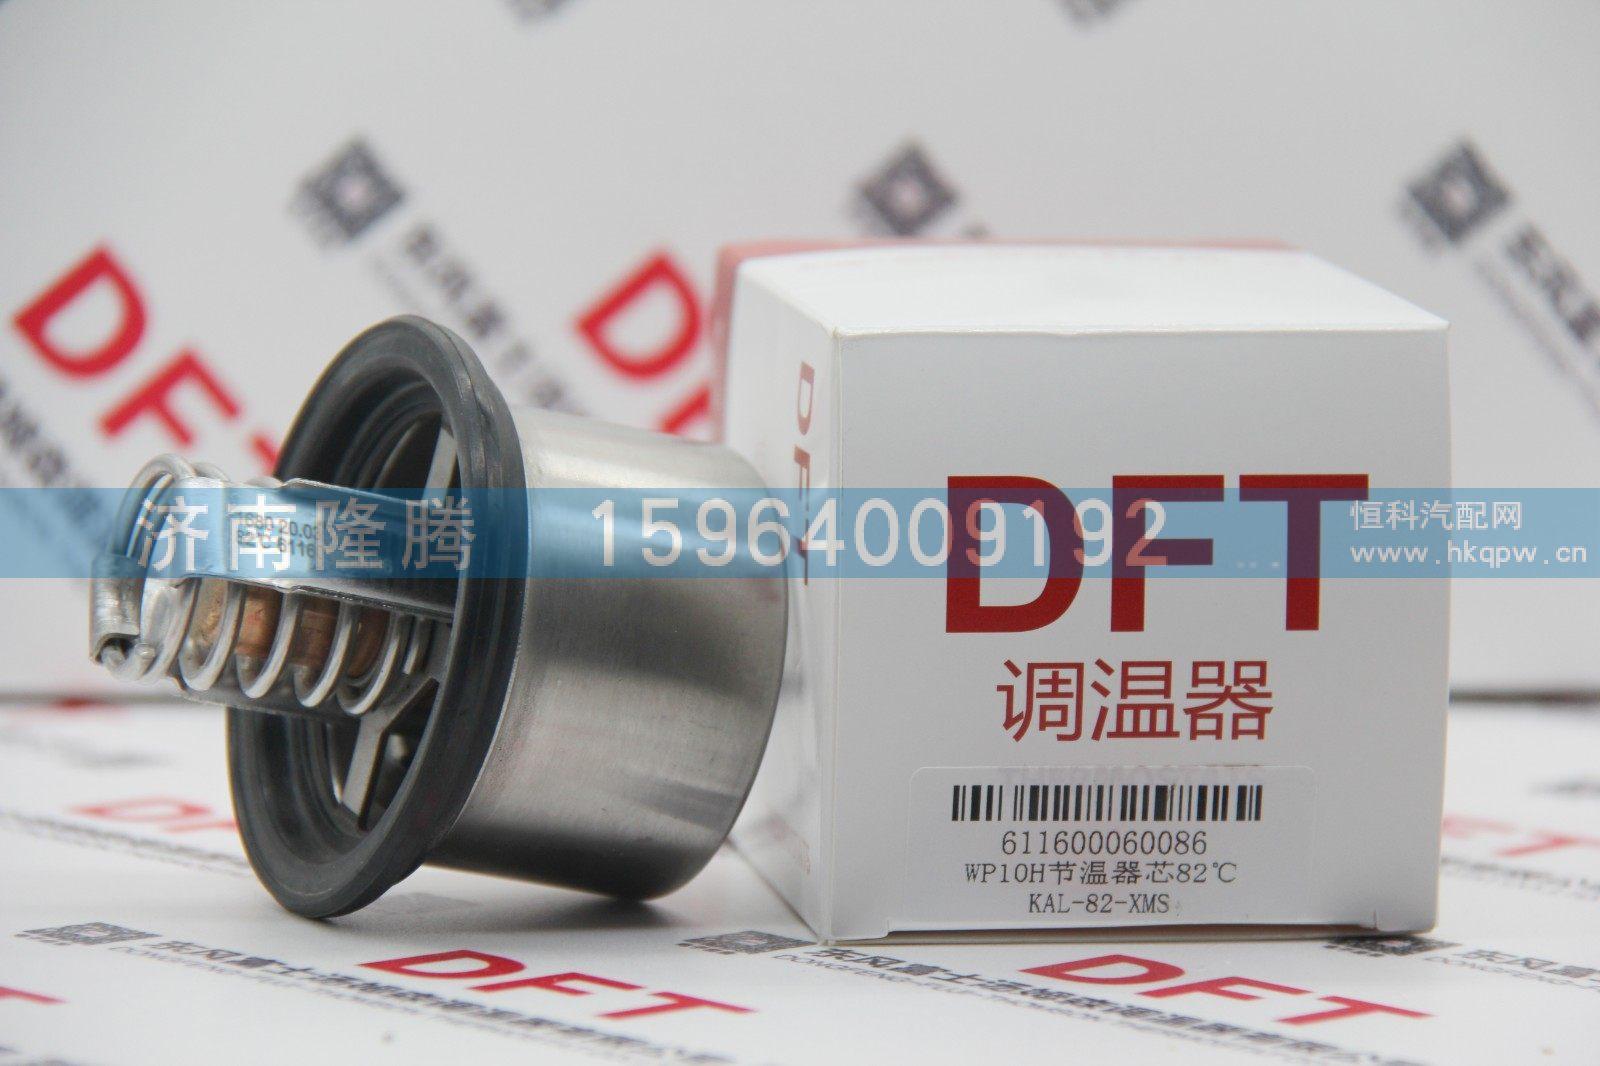 WP10H节温器芯82℃ 611600060086/611600060086